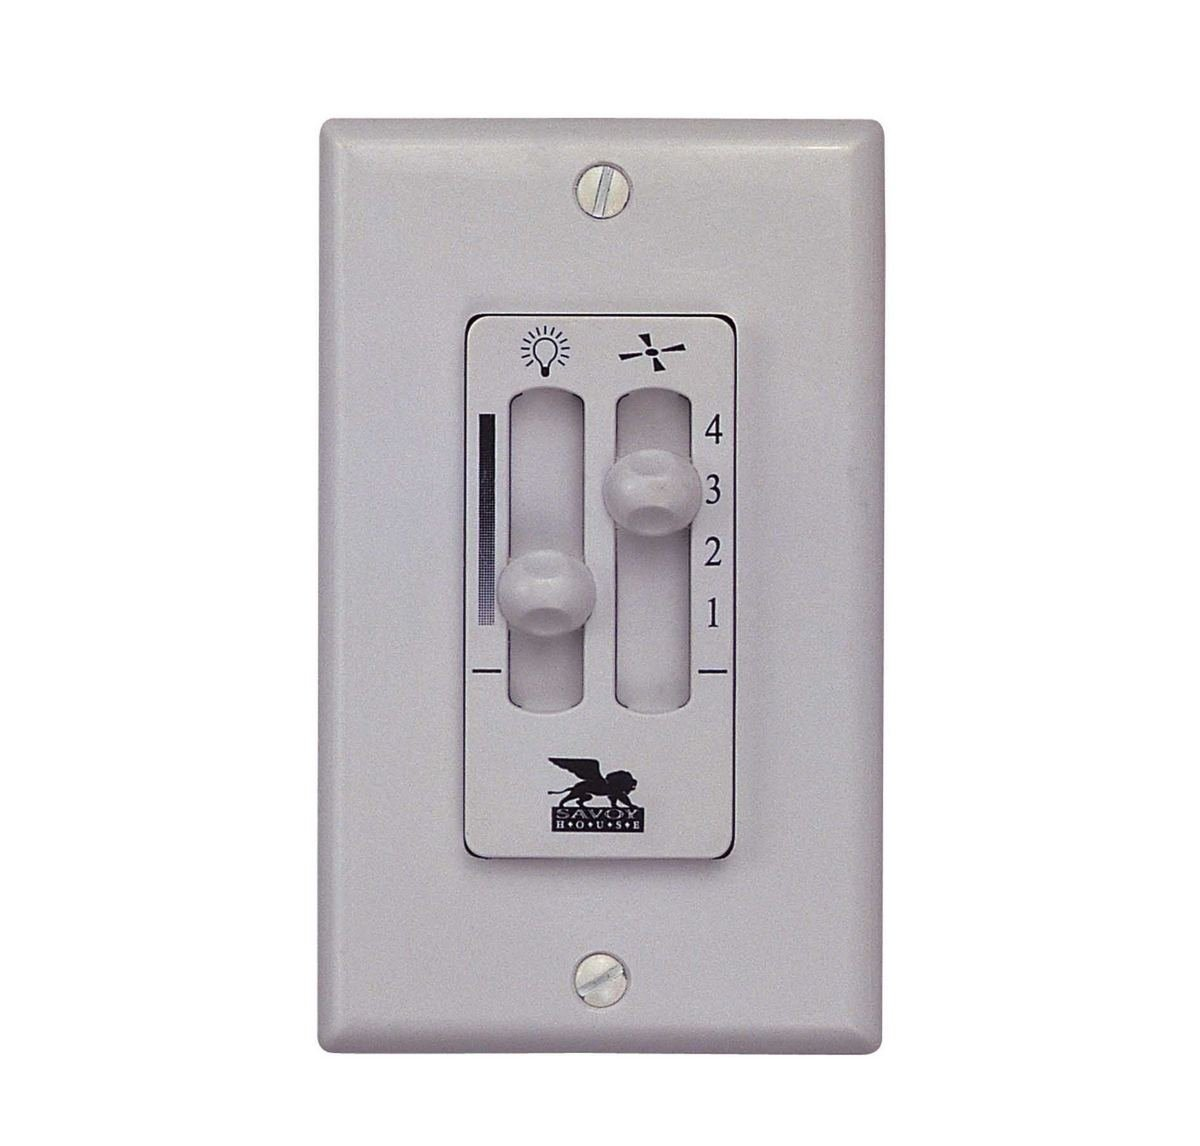 Savoy House WLC600 Fan/Light Wall Control